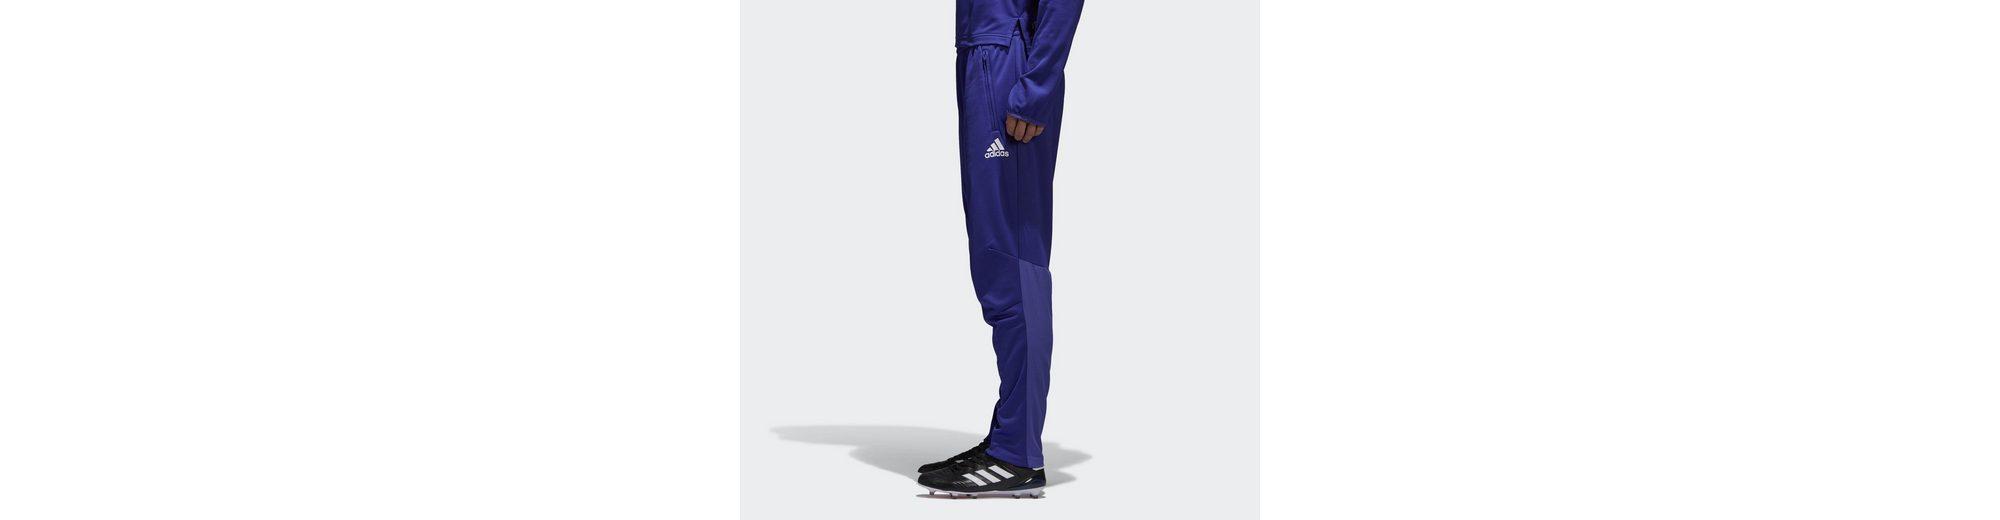 adidas Performance Trainingshose Olympique Marseille Billig Verkauf Beruf Günstig Kaufen Nicekicks Footaction Günstiger Preis ESIcp9